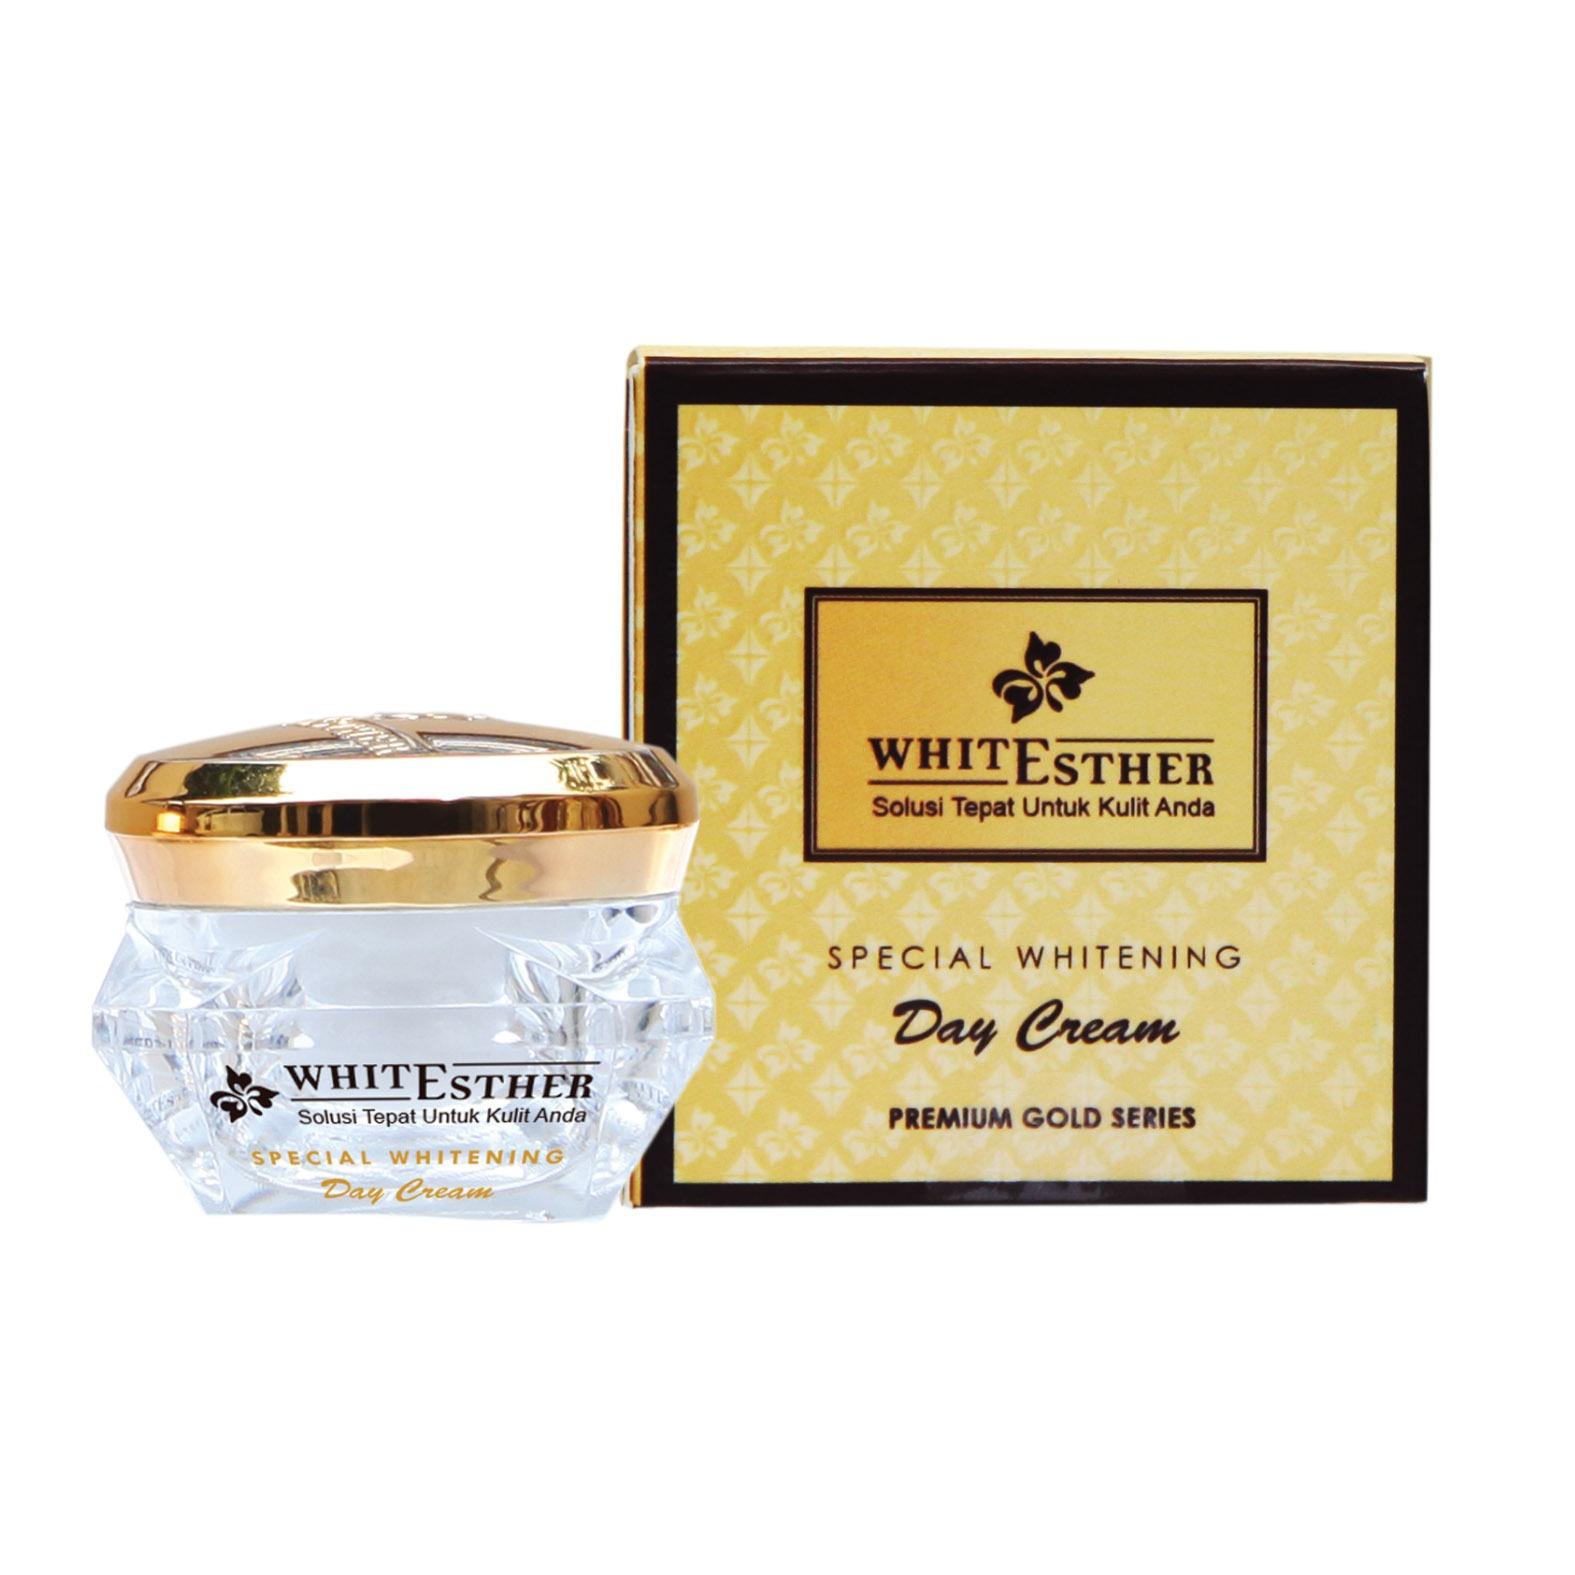 Whitesther Special Whitening Night Cream